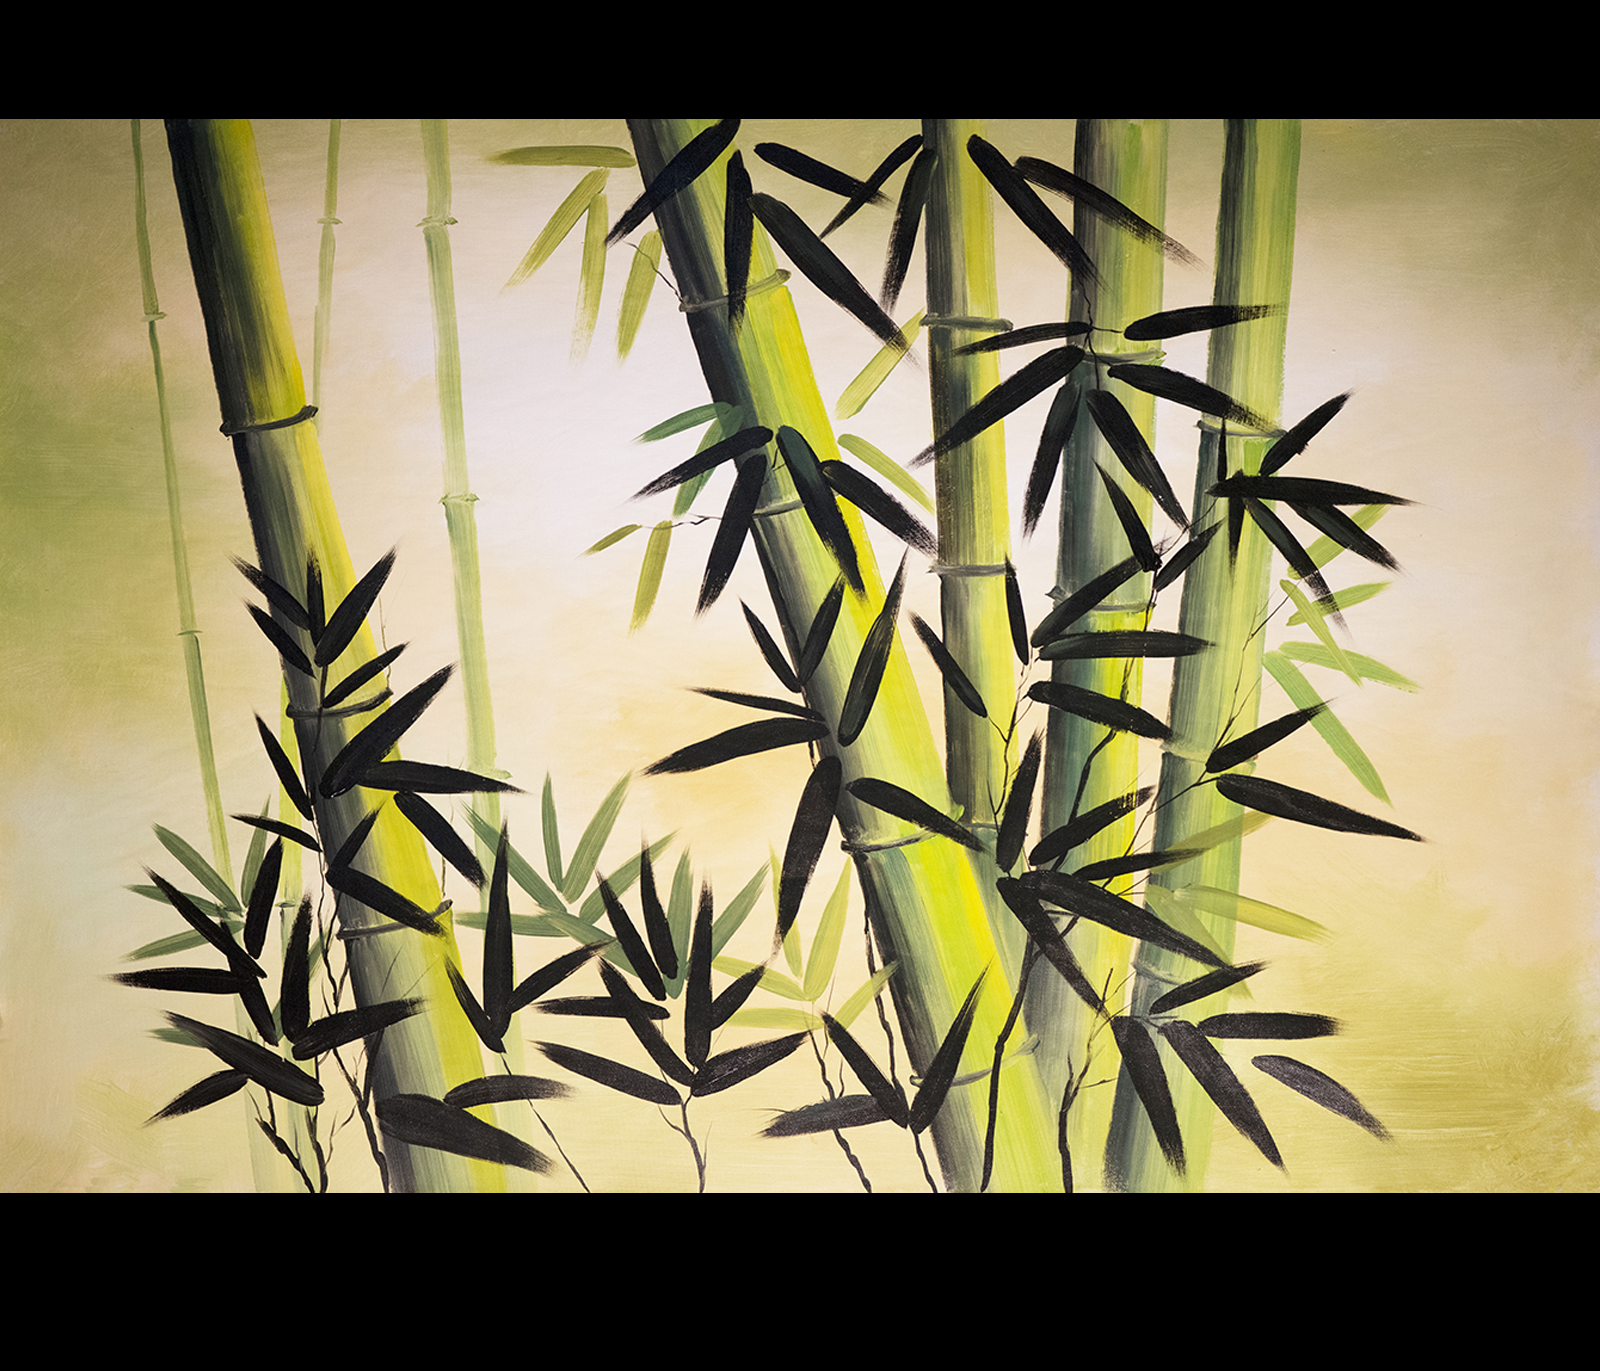 Bamboo Wall Art - Elitflat